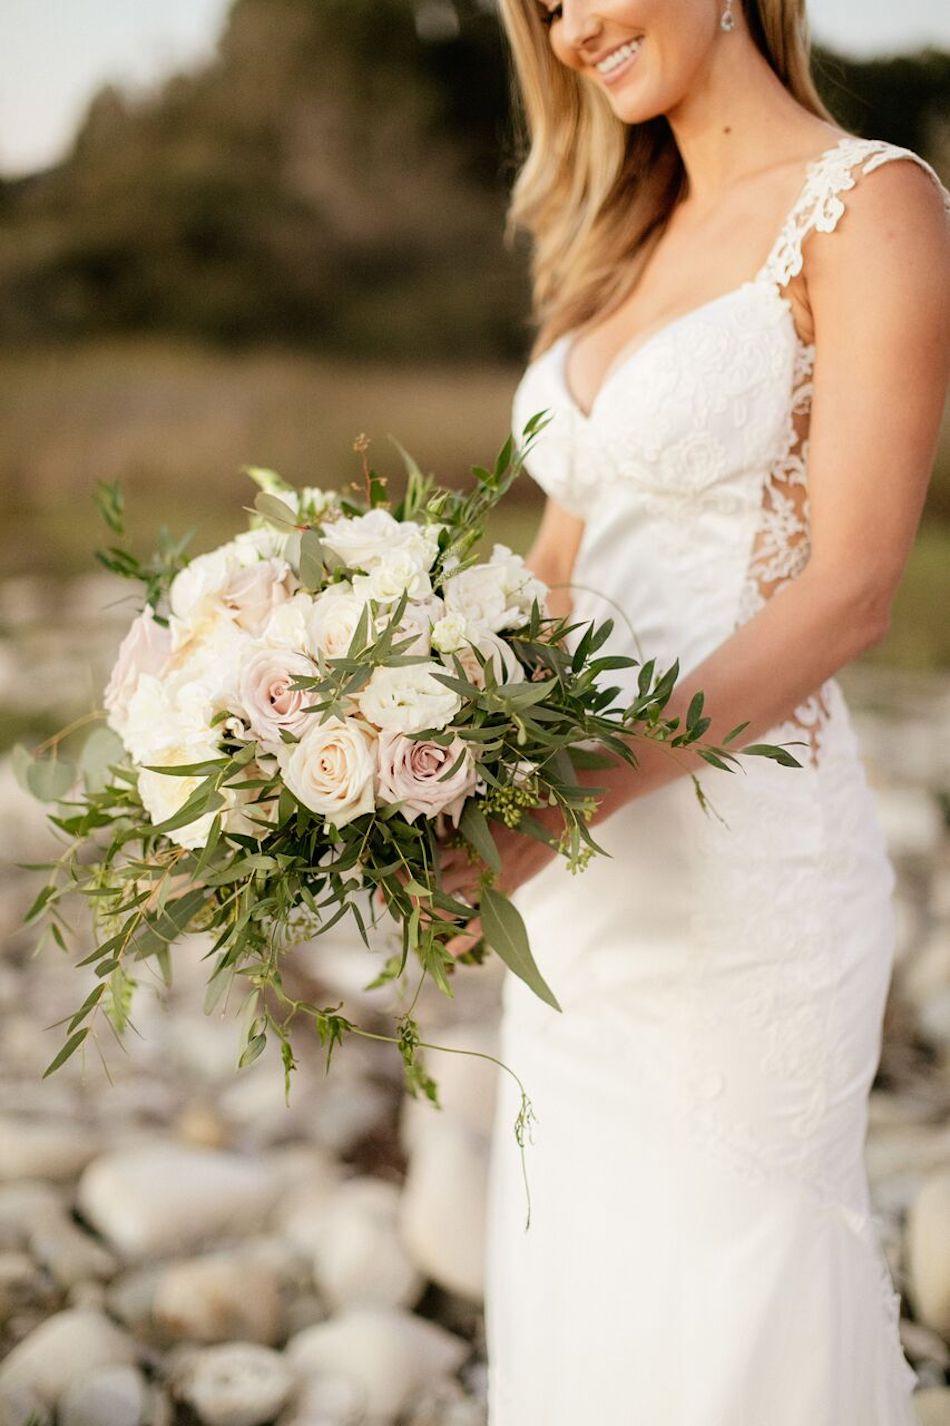 bride, elegant white, white wedding, bouquet, wedding flowers, flowers by cina